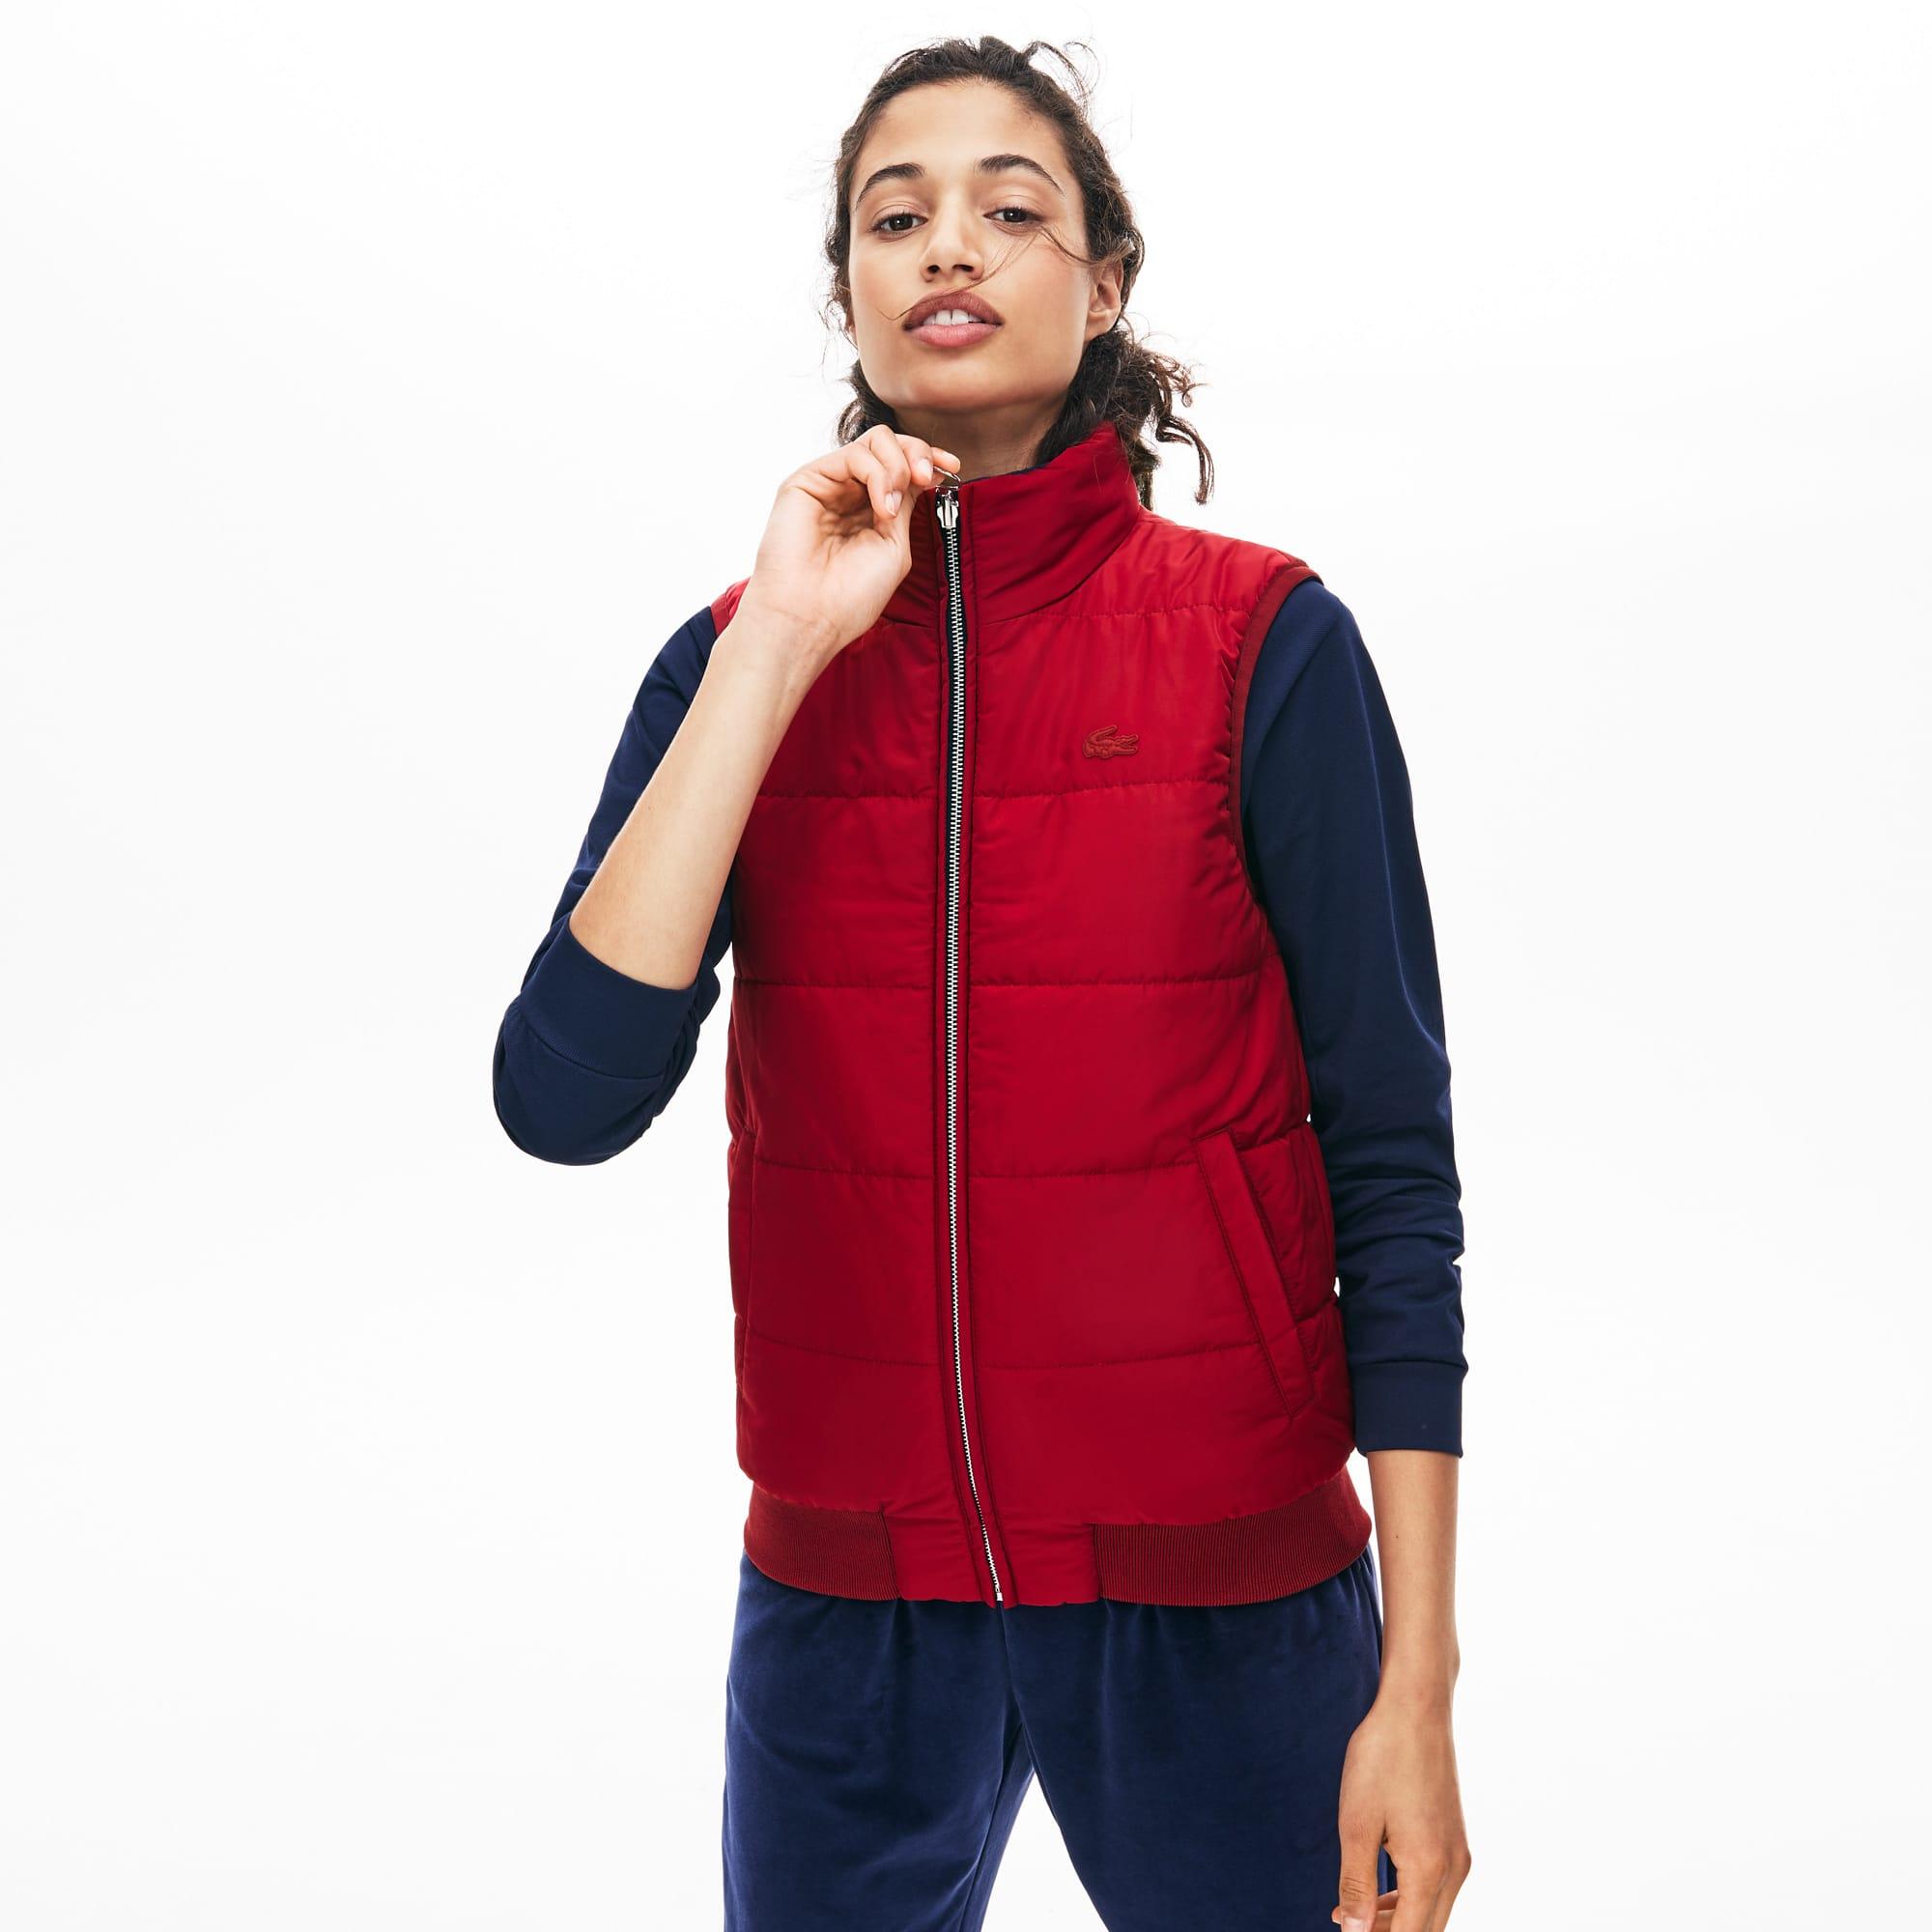 Lacoste Coats Women's Reversible Hooded Vest